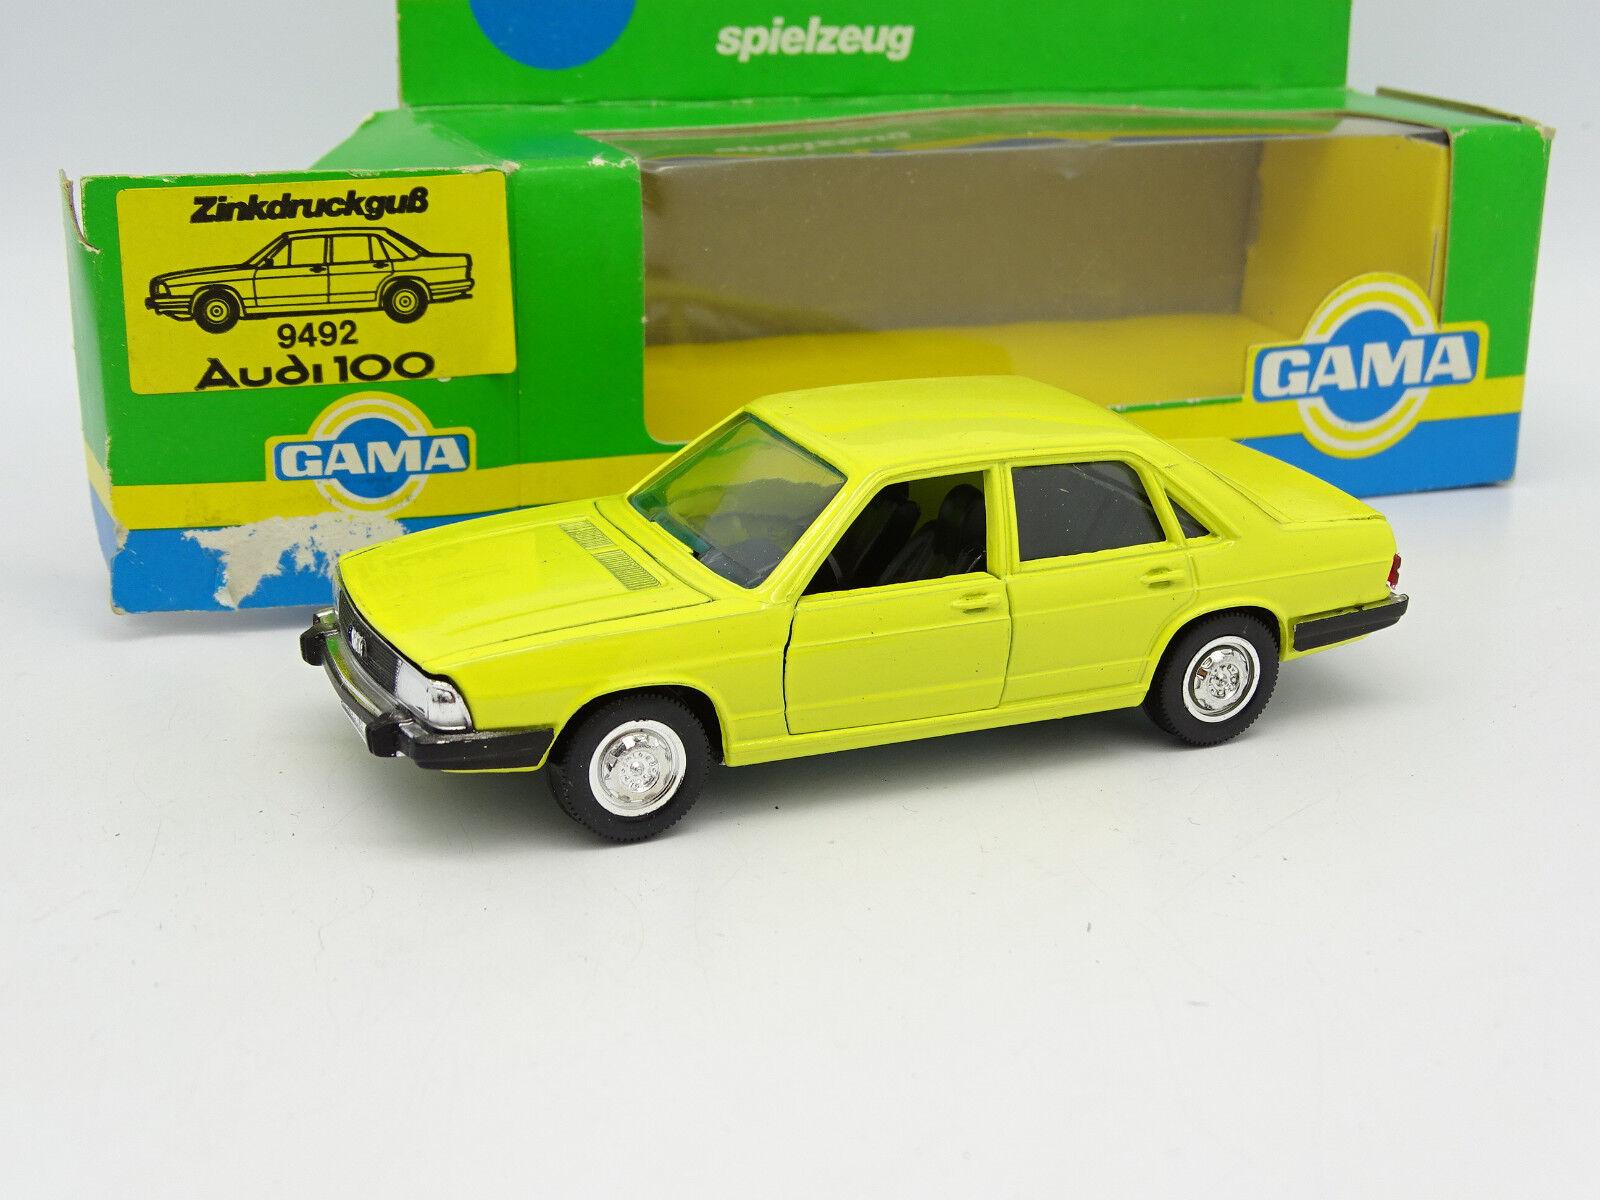 Gama Mini 1 43 43 43 - Audi 100 yellow B 8f0db7